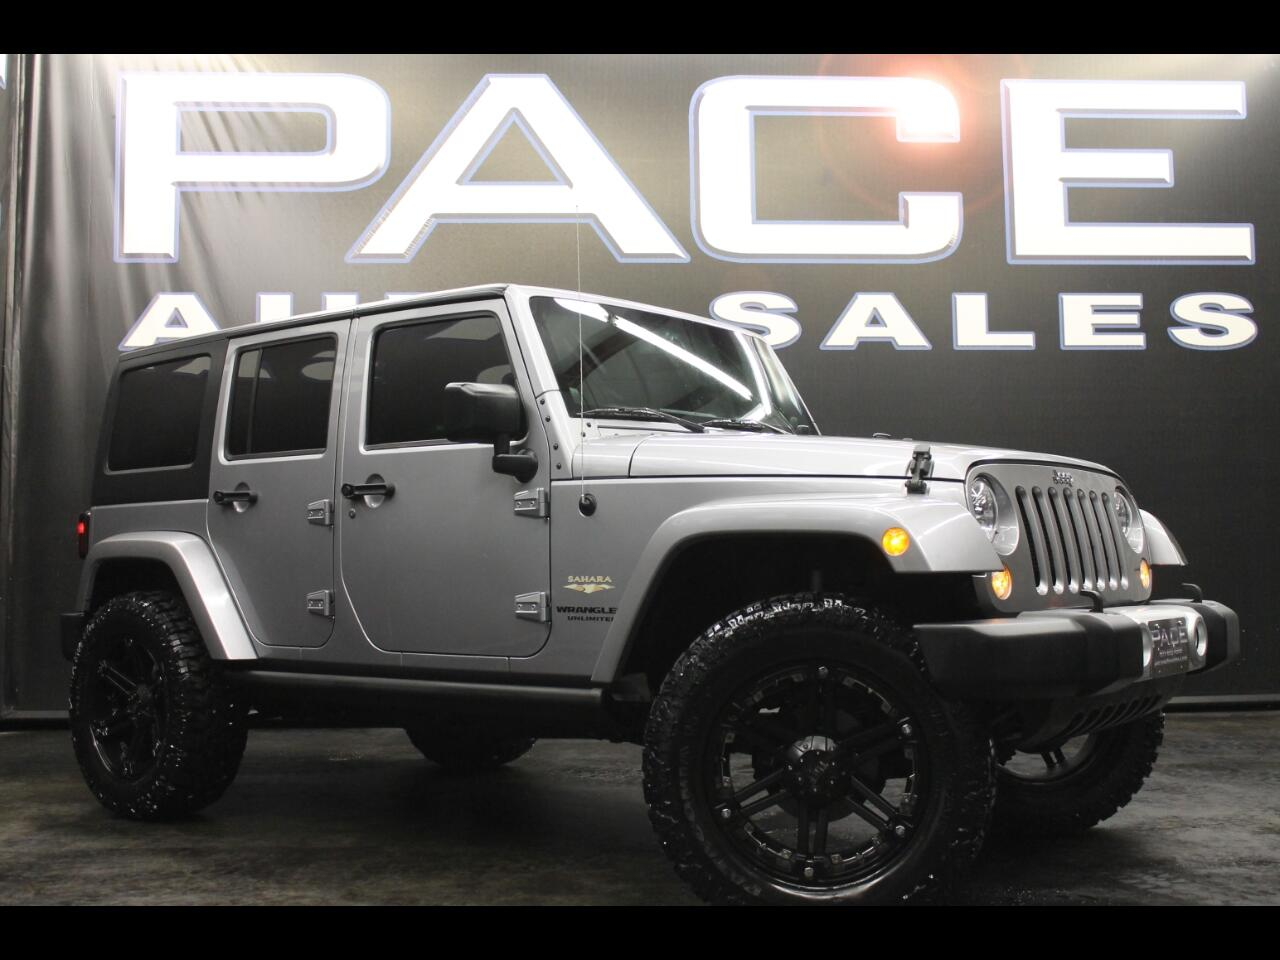 2014 Jeep Wrangler Unlimited 4WD 4dr Sahara Lifted Custom